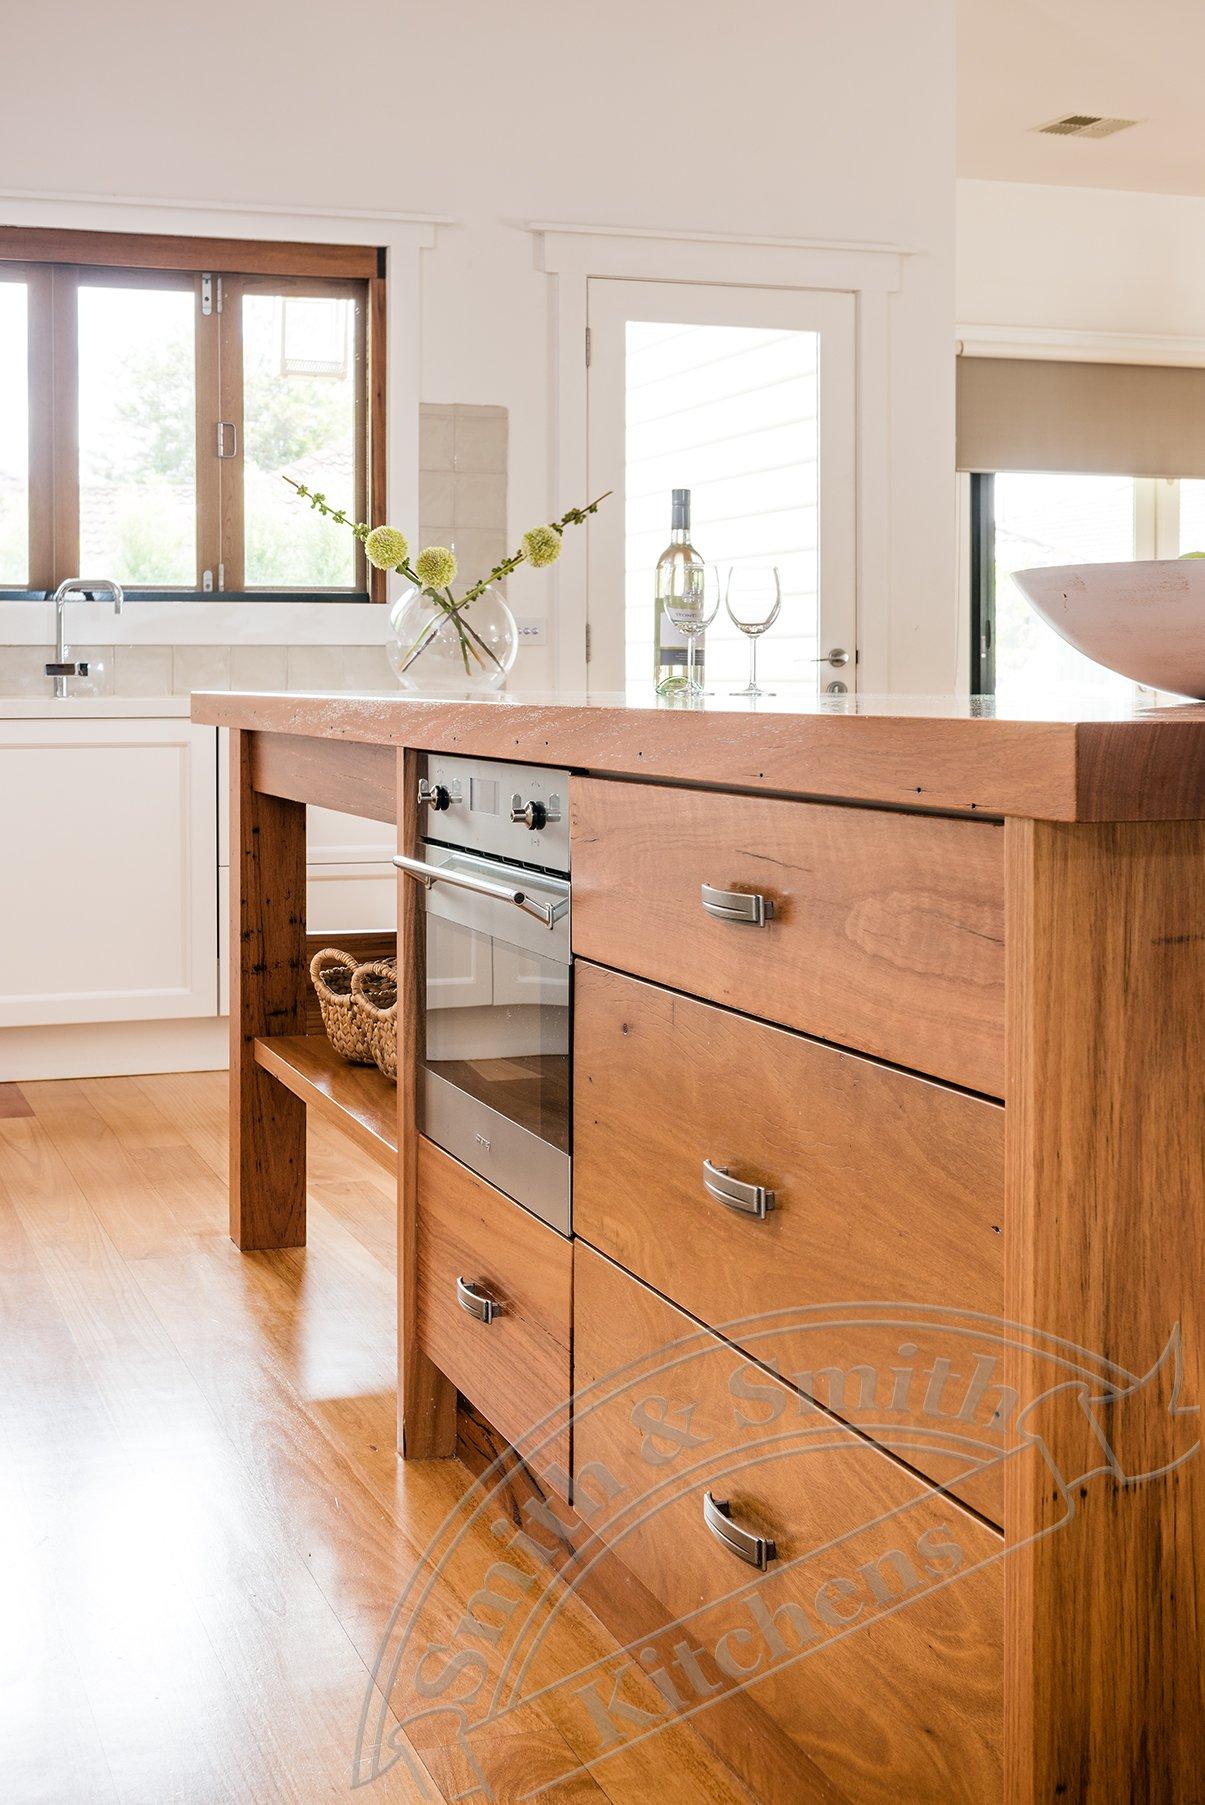 Smith Smith Kitchens: Kitchen Design Gallery